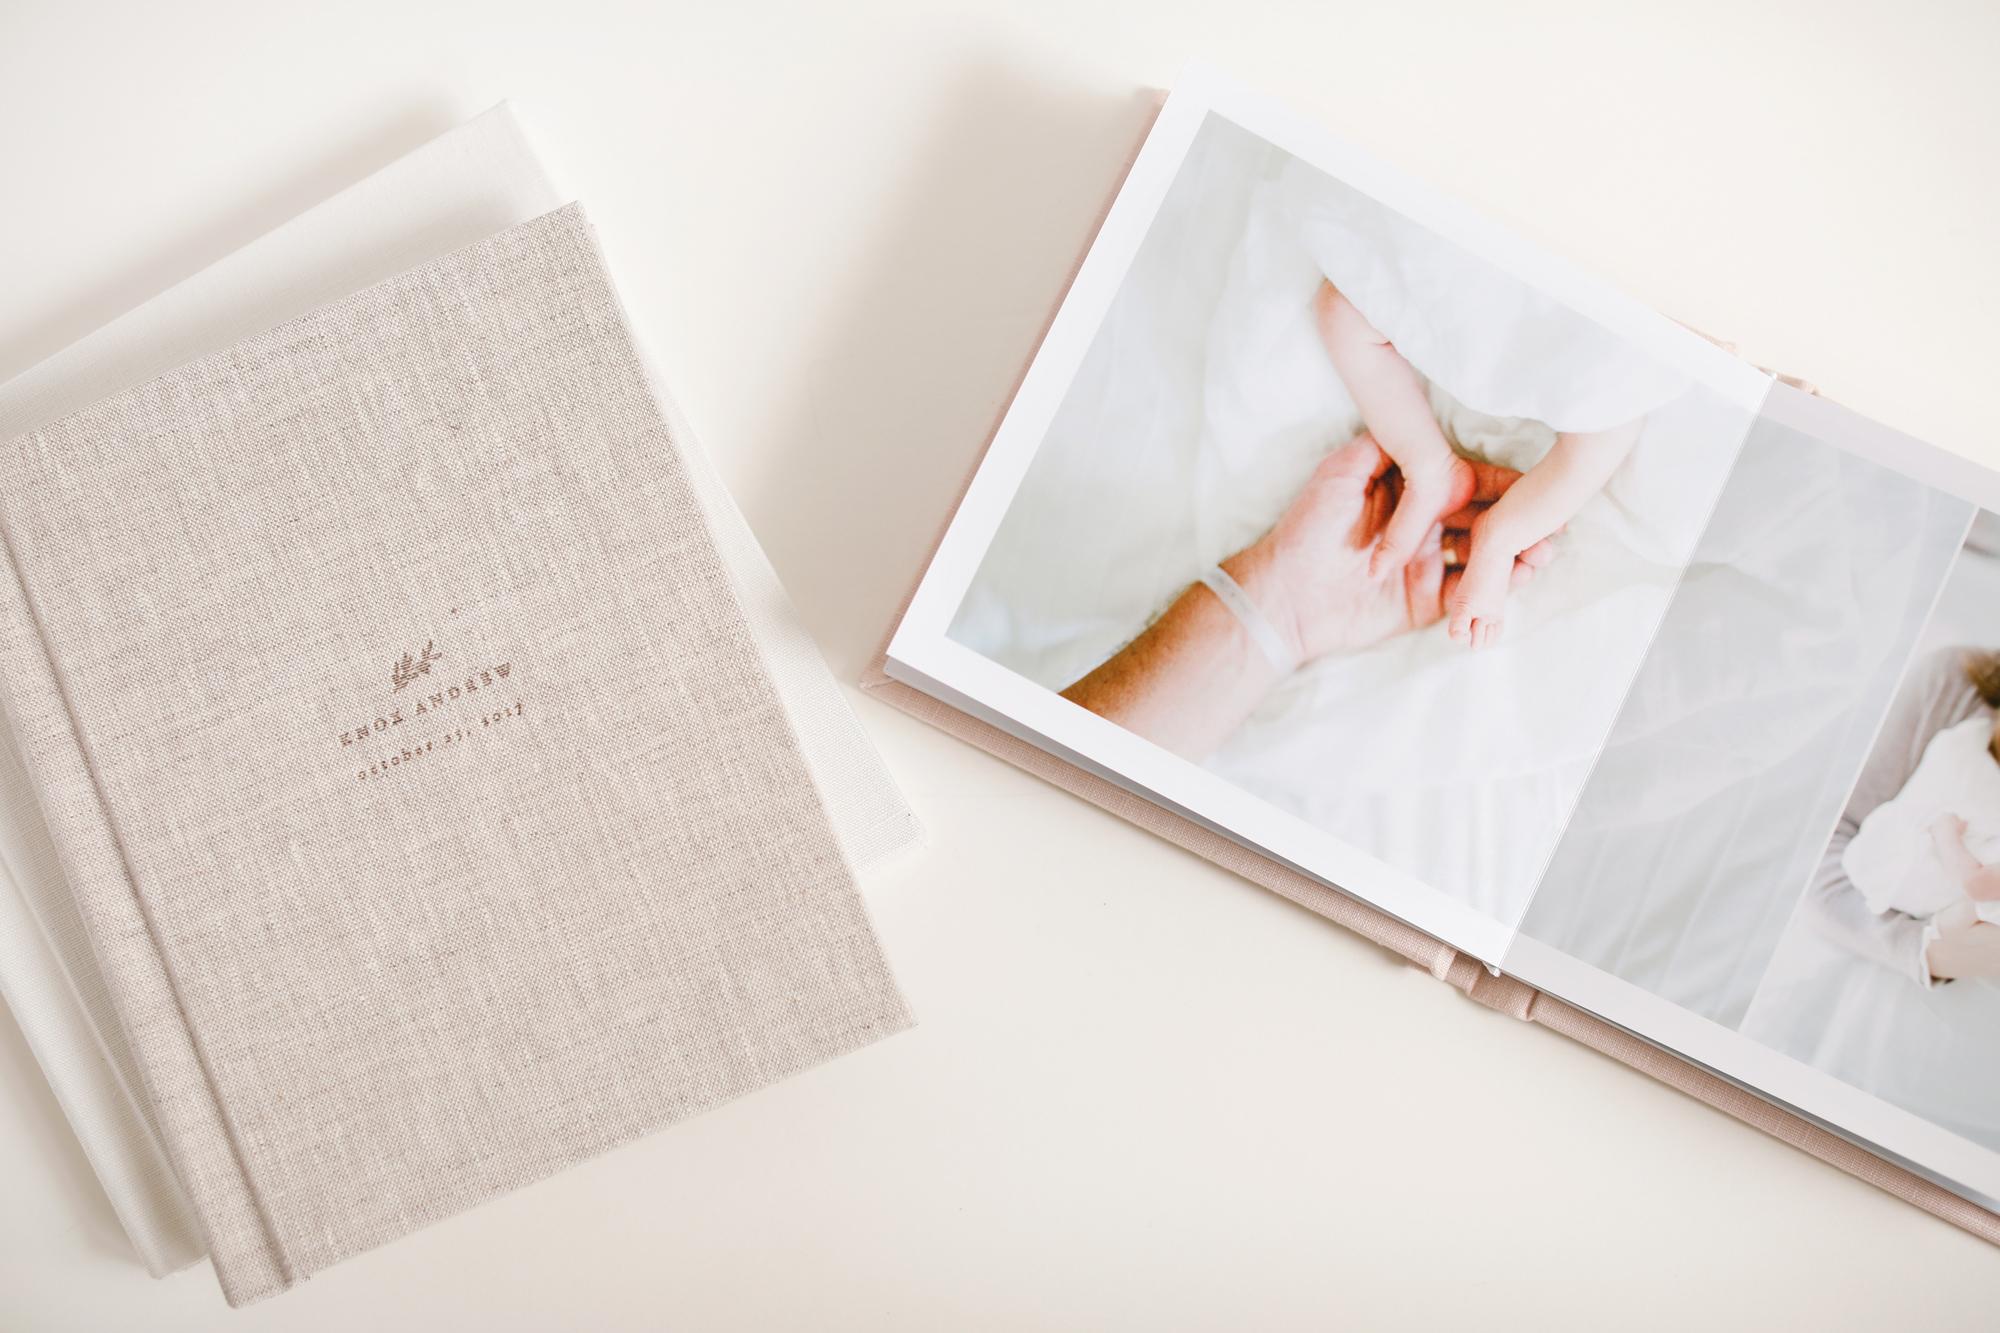 raleigh-lifestyle-newborn-film-photographer-albums-baby-books